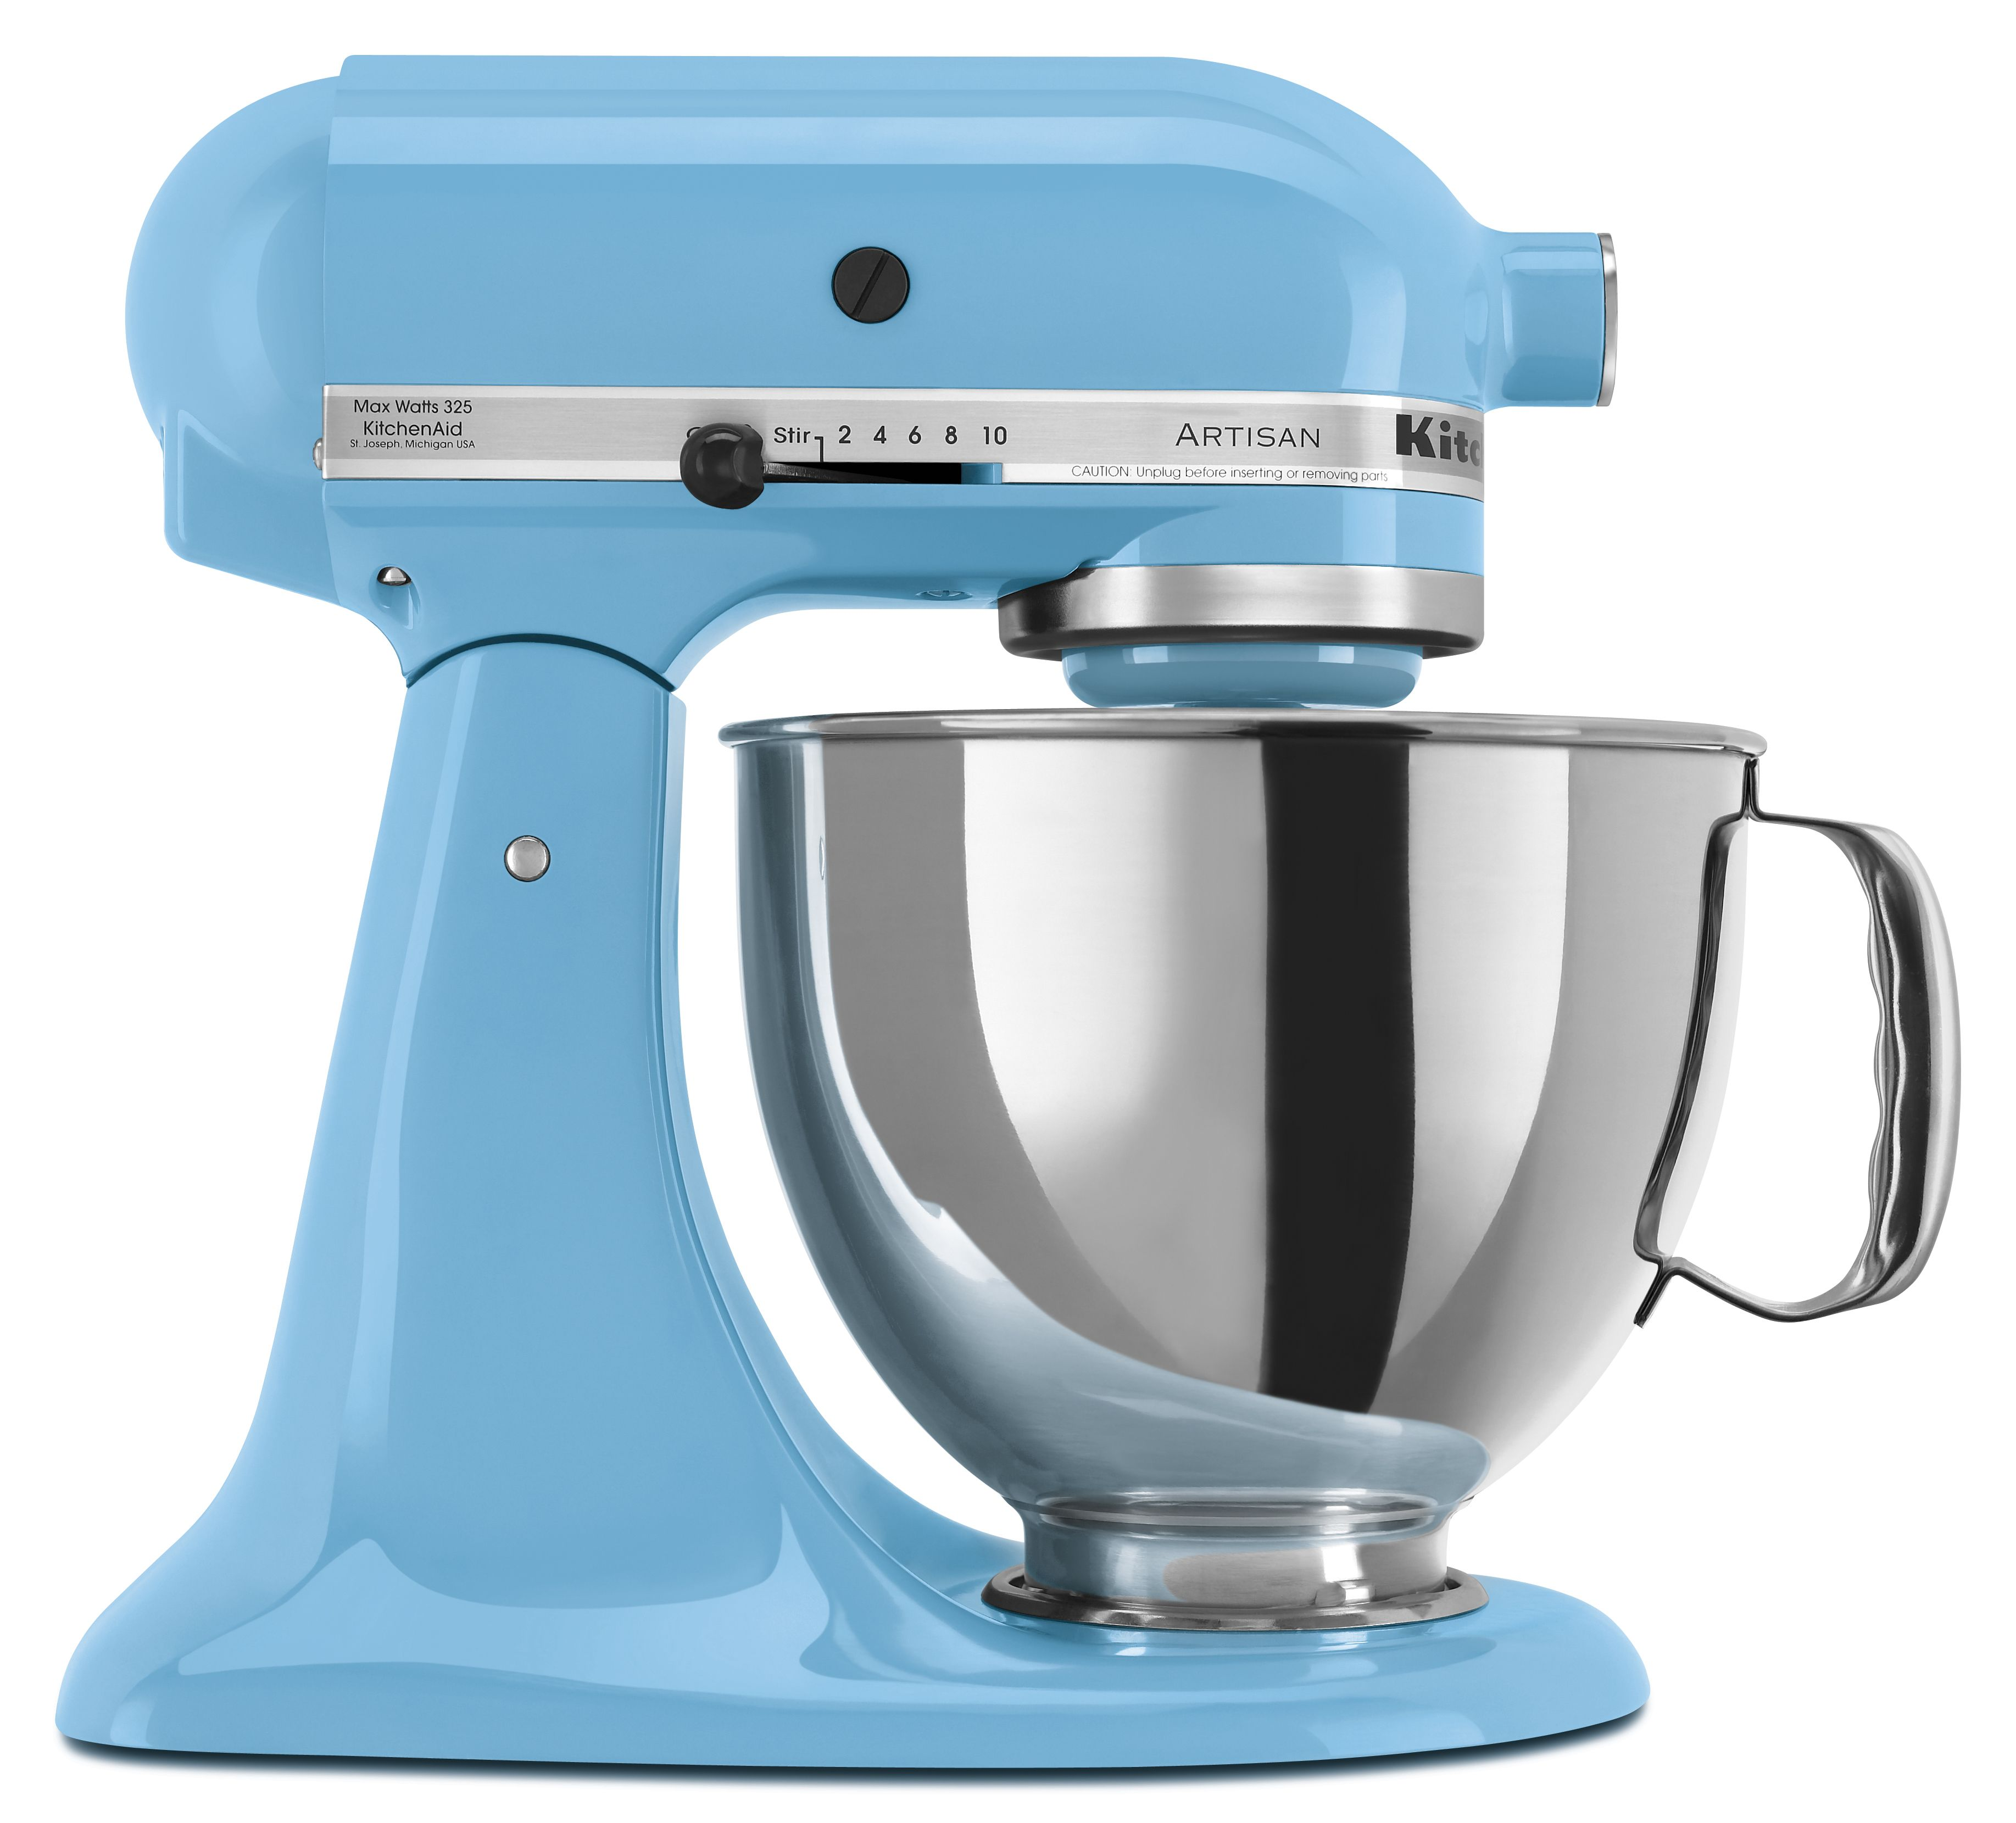 KitchenAid Artisan Stand Mixer in Crystal Blue a vision......I wish ...